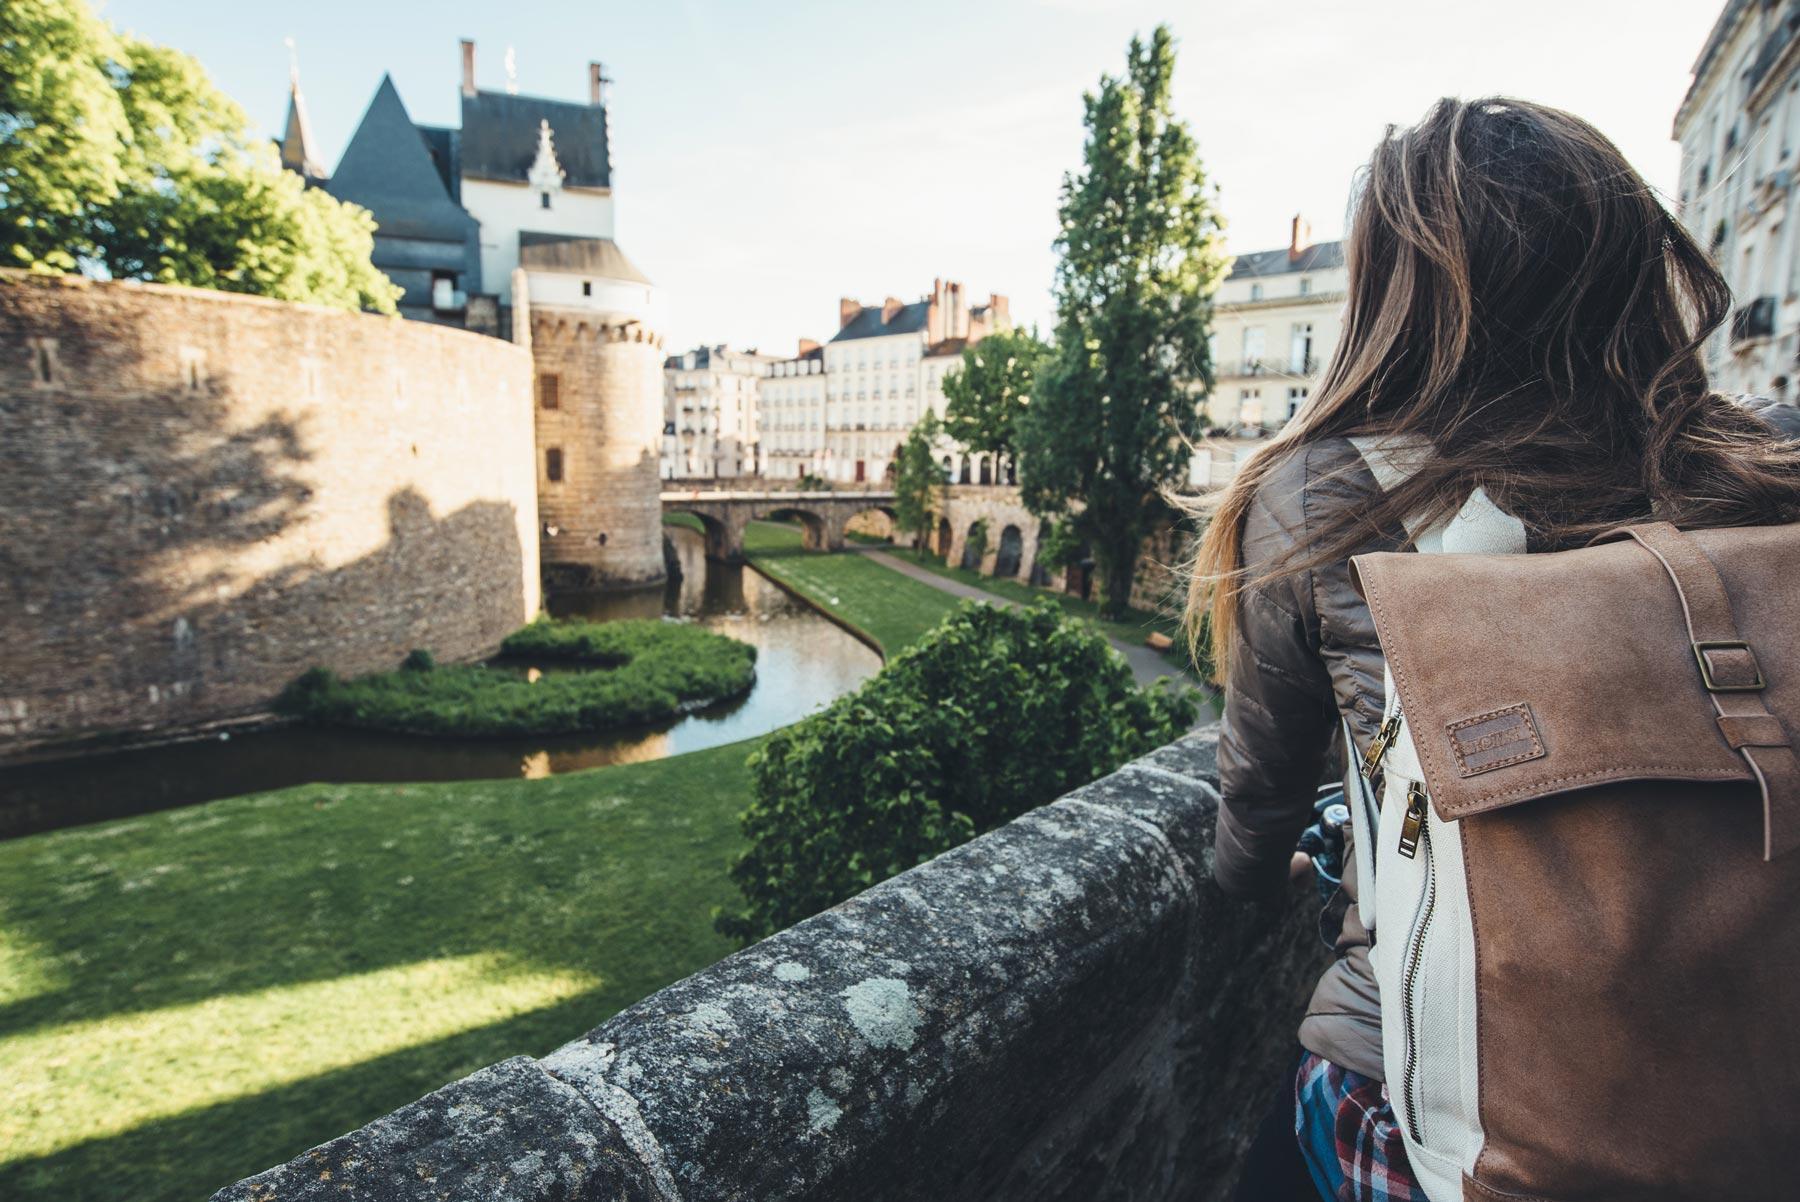 Chateau des Ducs de Bretagnes, Nantes